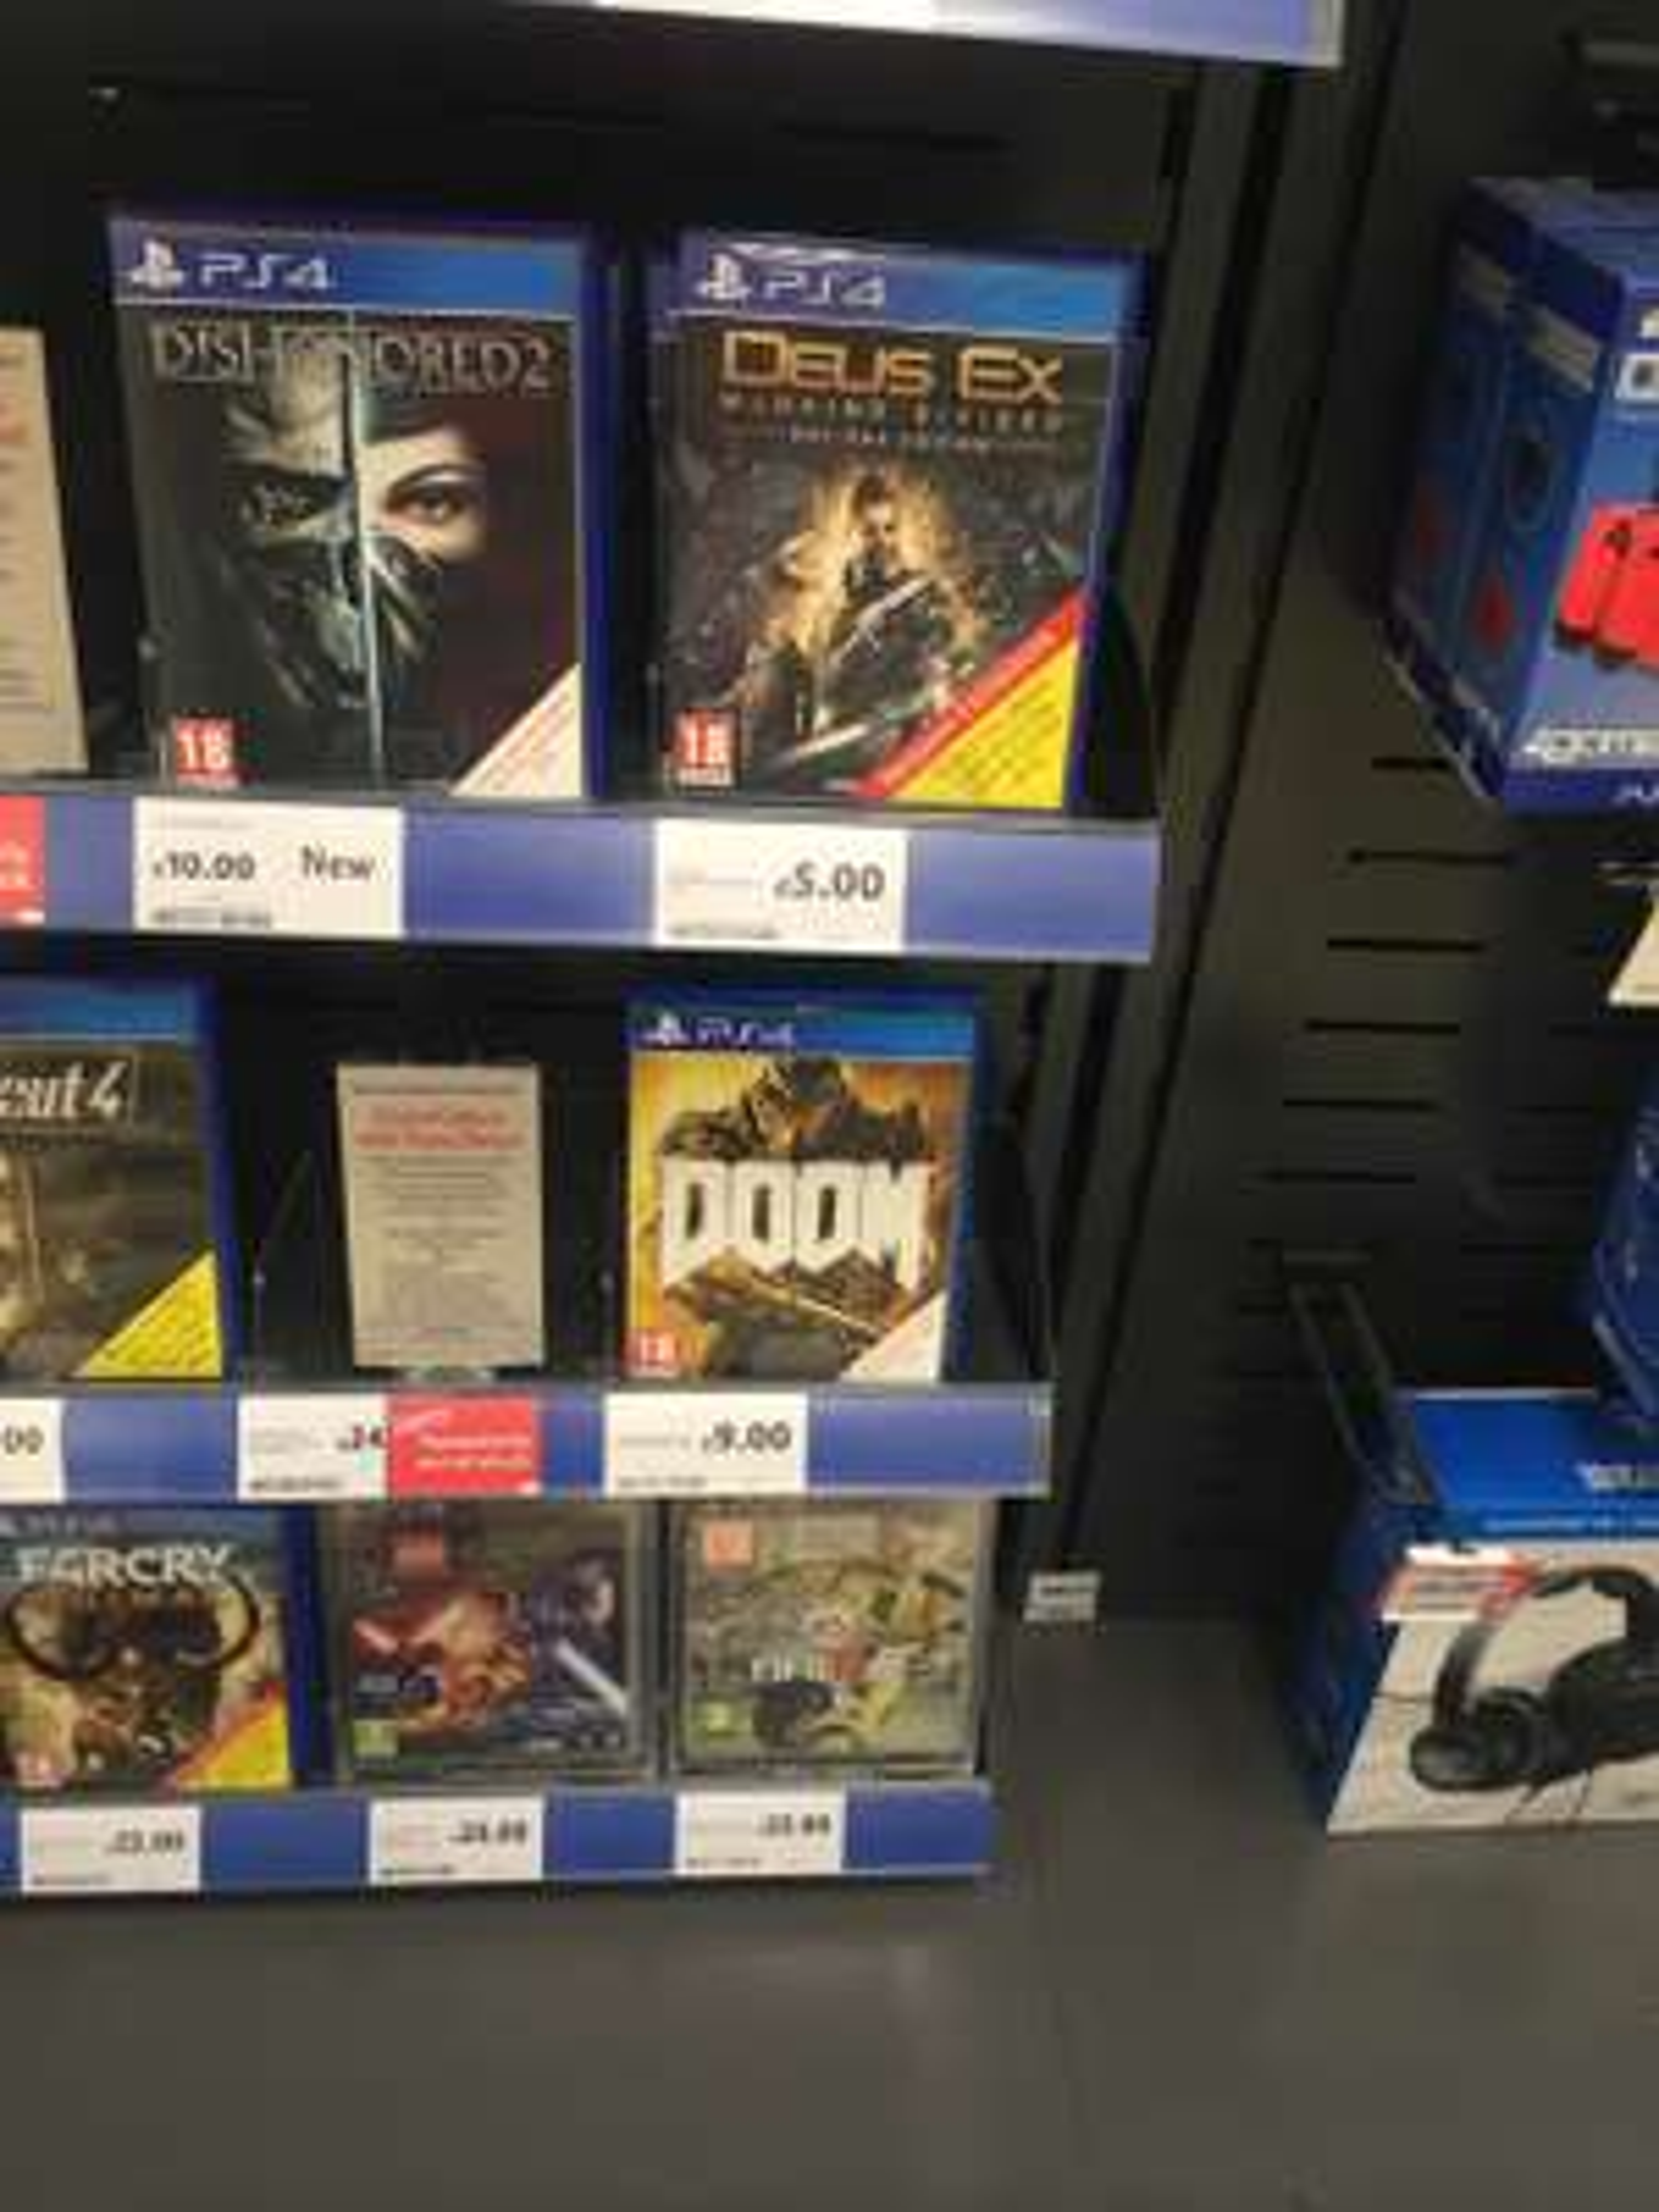 Doom (PS4) £9, Deus Ex (PS4) £5 at Tesco (Gateshead)